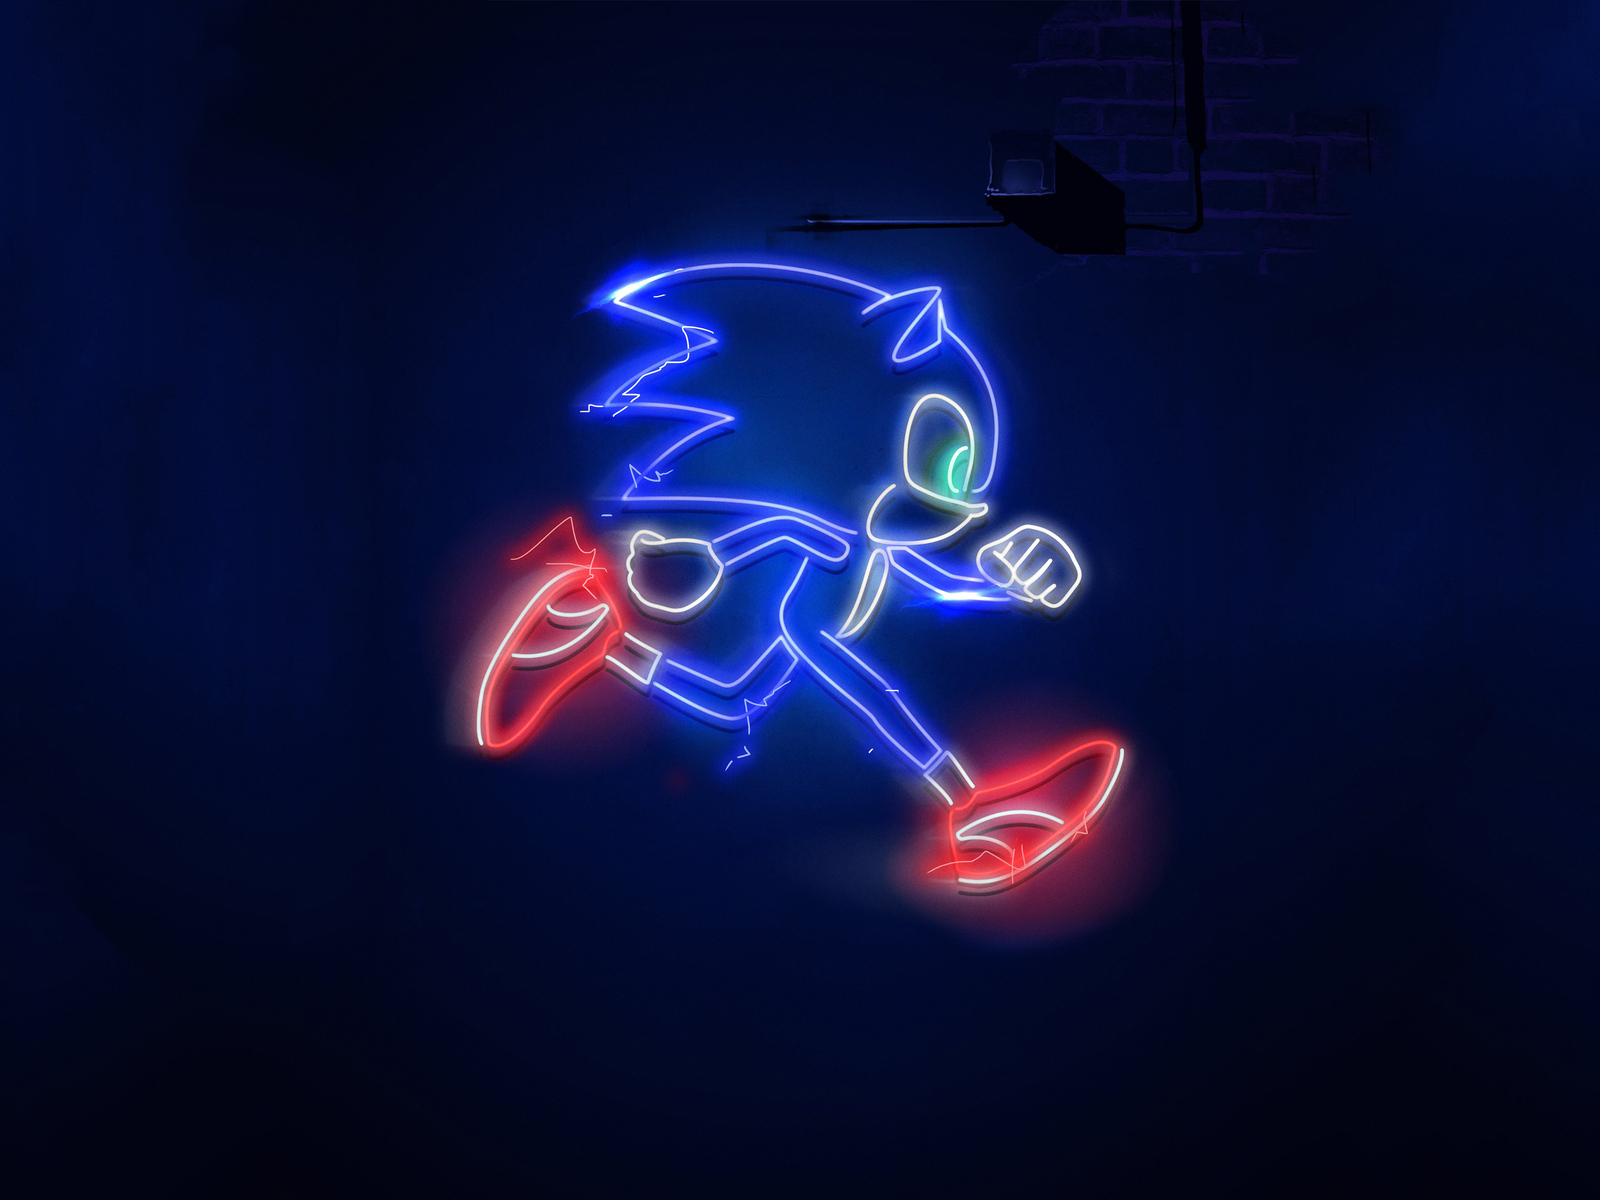 sonic-the-hedgehog-movie-4k-2020-3b.jpg